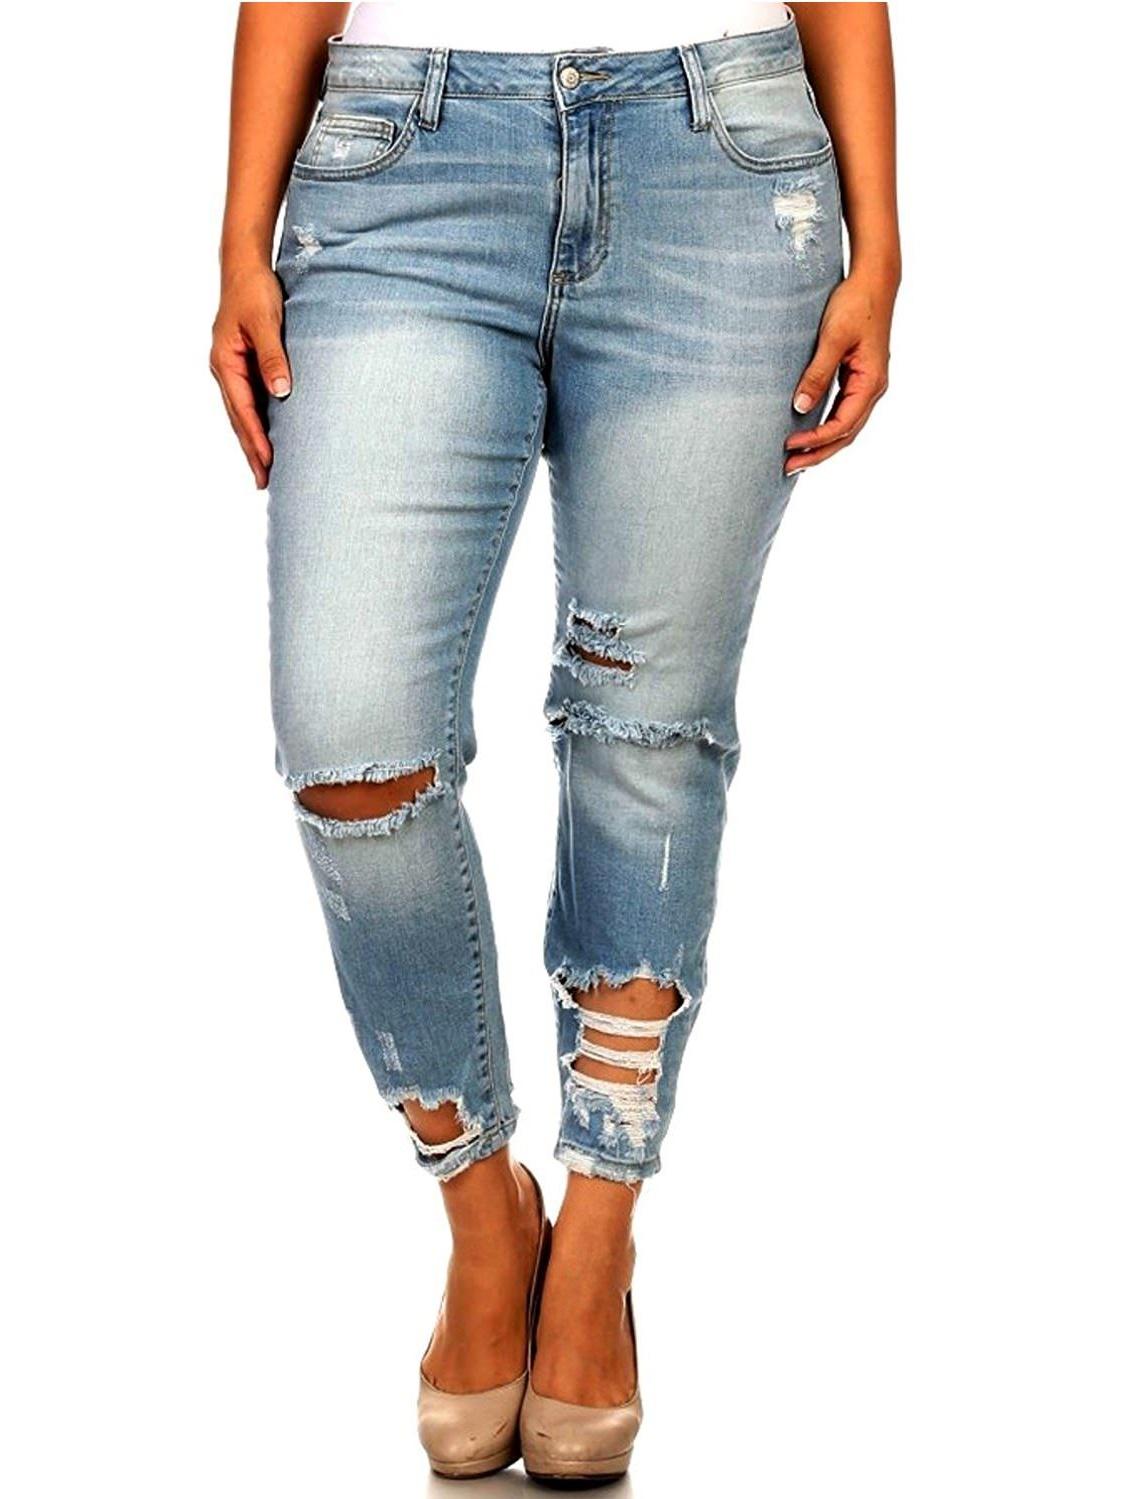 Jack David WOMENS PLUS SIZE Sexy Boyfriend Denim Jeans Ripped Distressed strech pants WV74422P